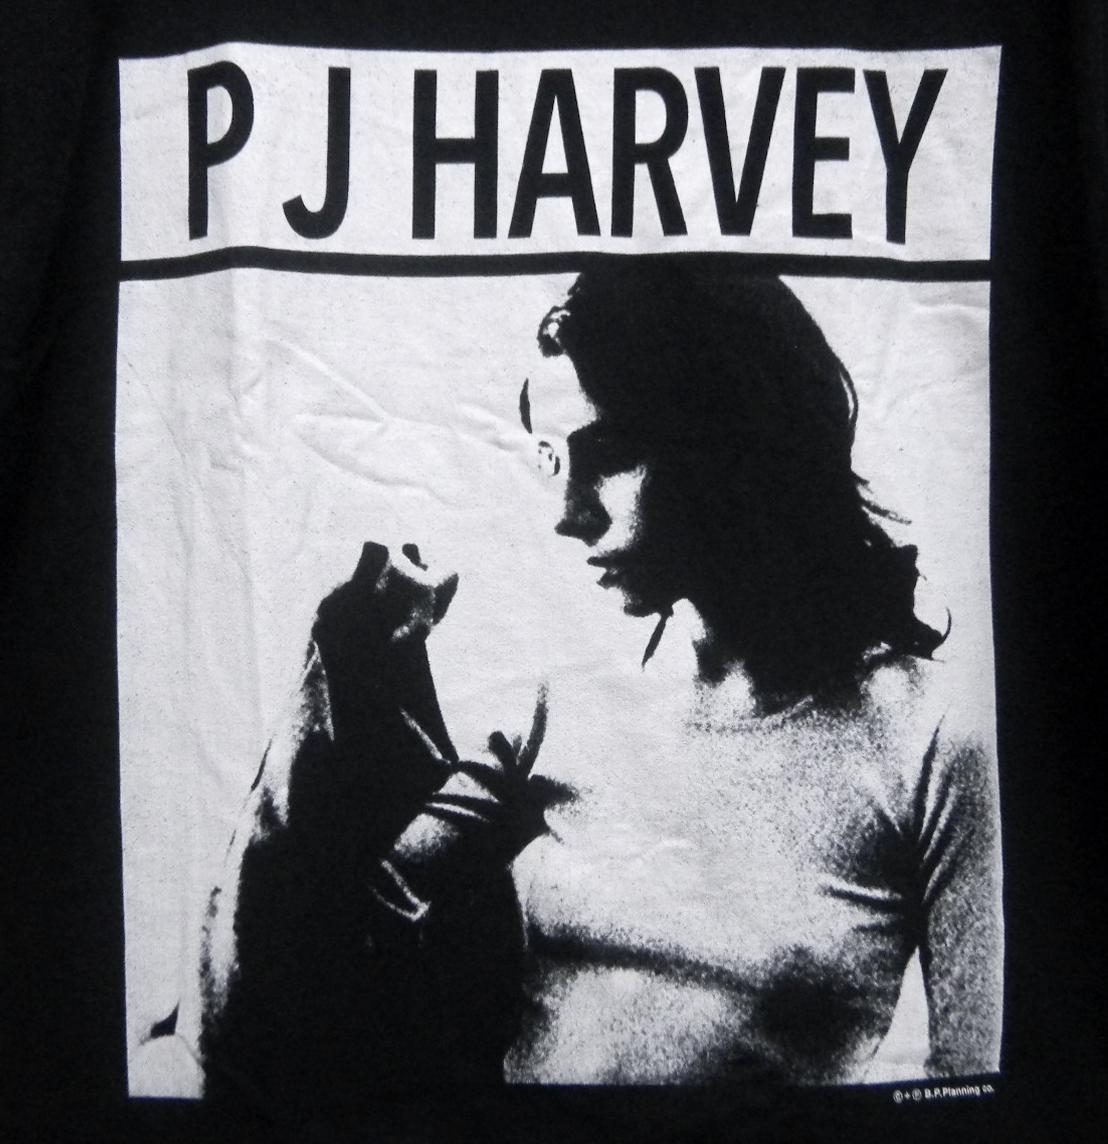 PJ Harvey Tシャツ sonic youth radiohead bjork nirvana aphex twin fugazi cocteau twins joy division my bloody valentine savages dvd